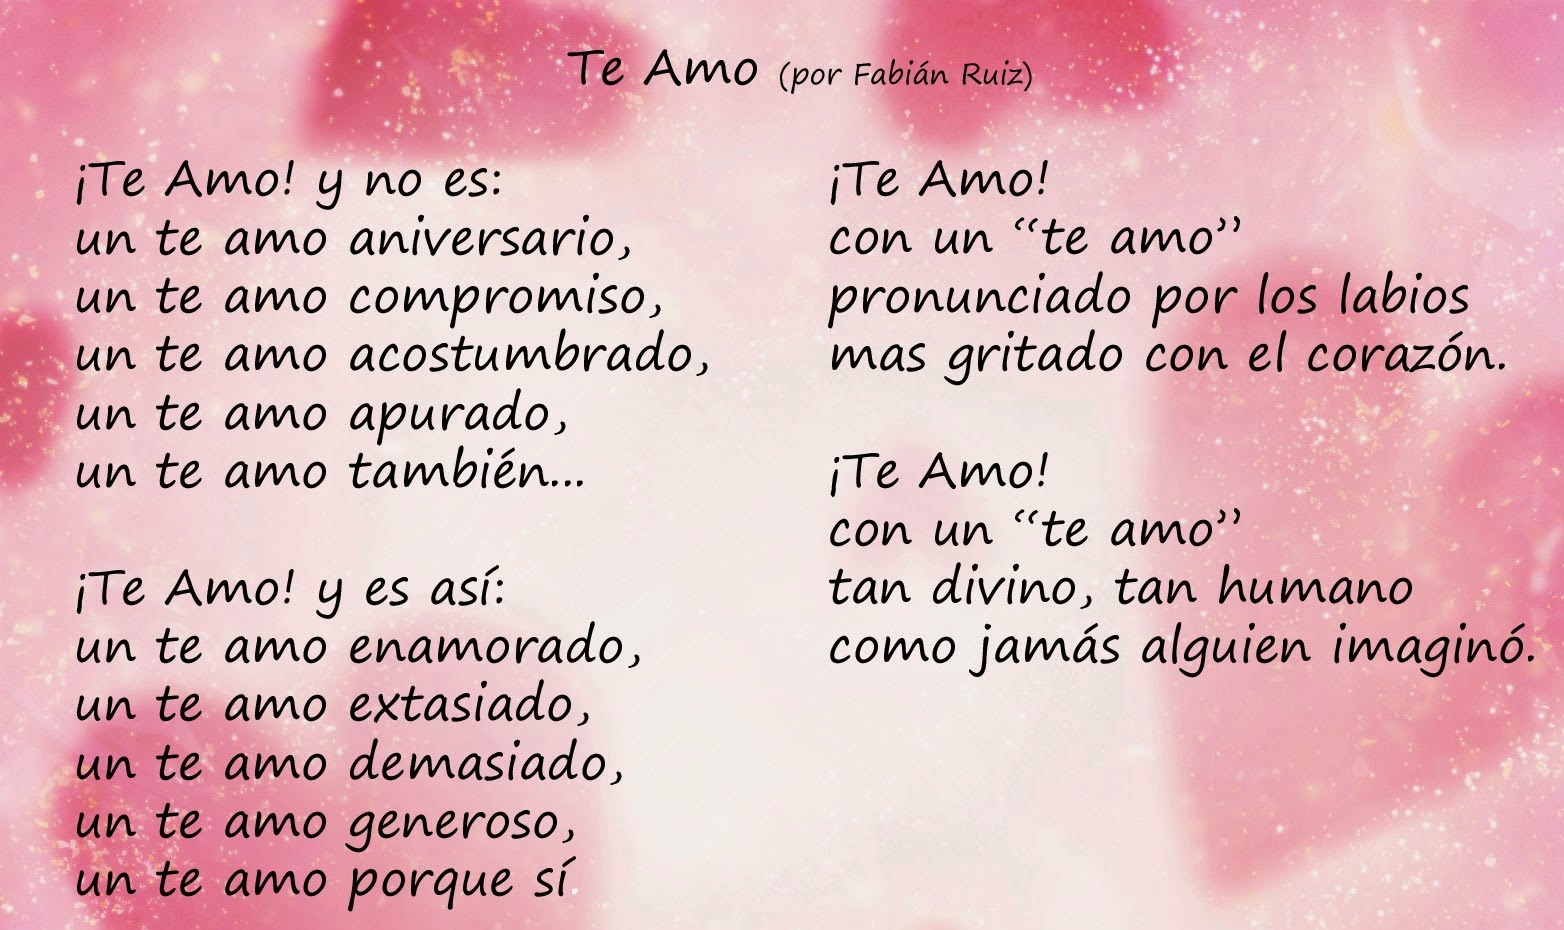 Frases bonitas del amor